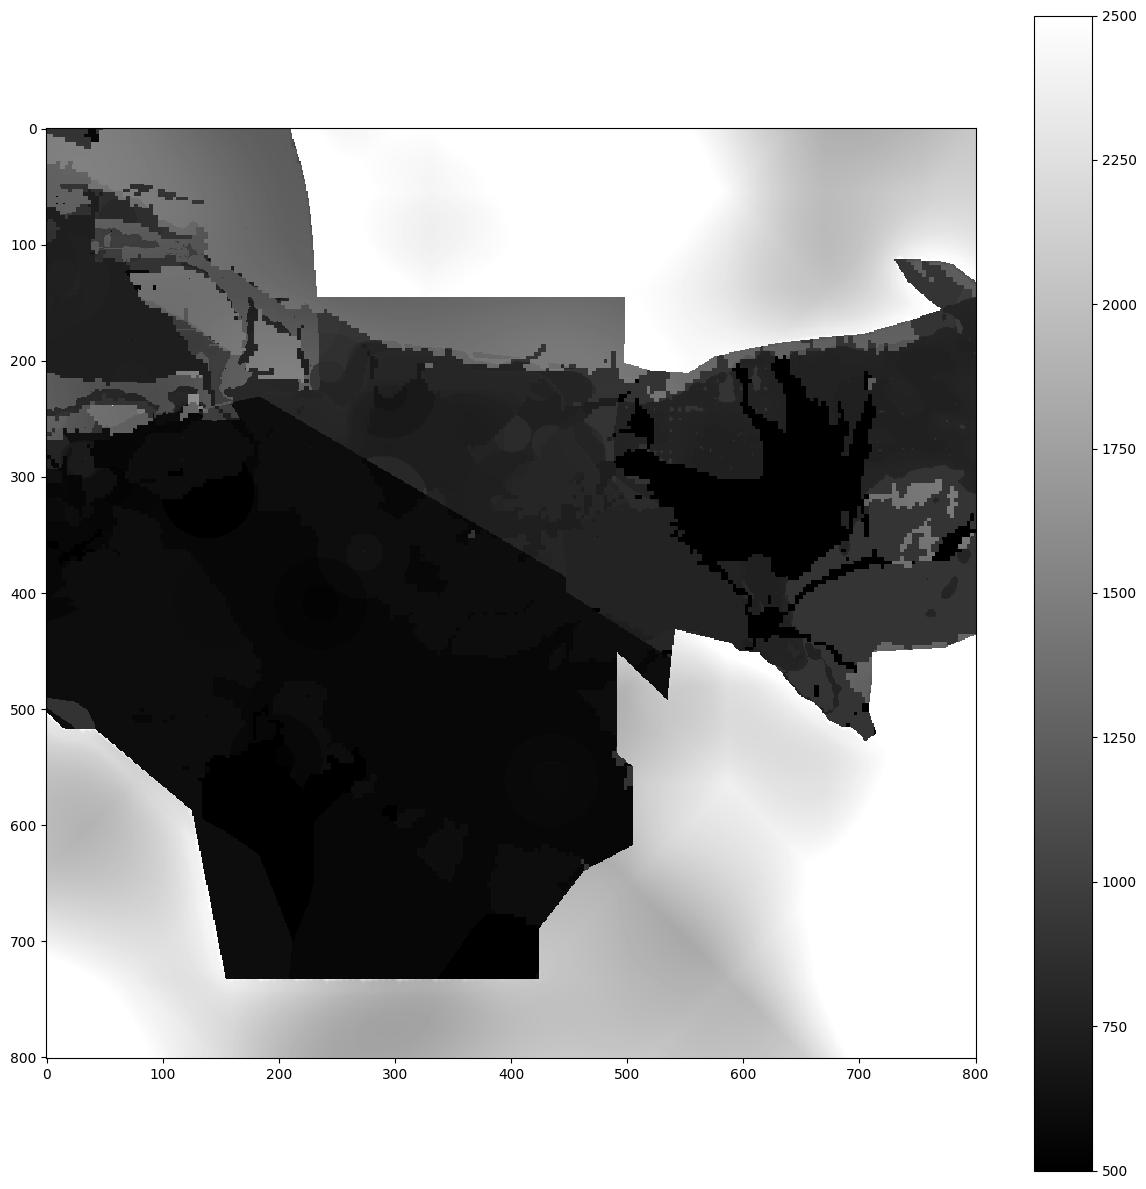 bench/seismic/wp/la_habra/meshes/velocity_model/plots/vs_100.png